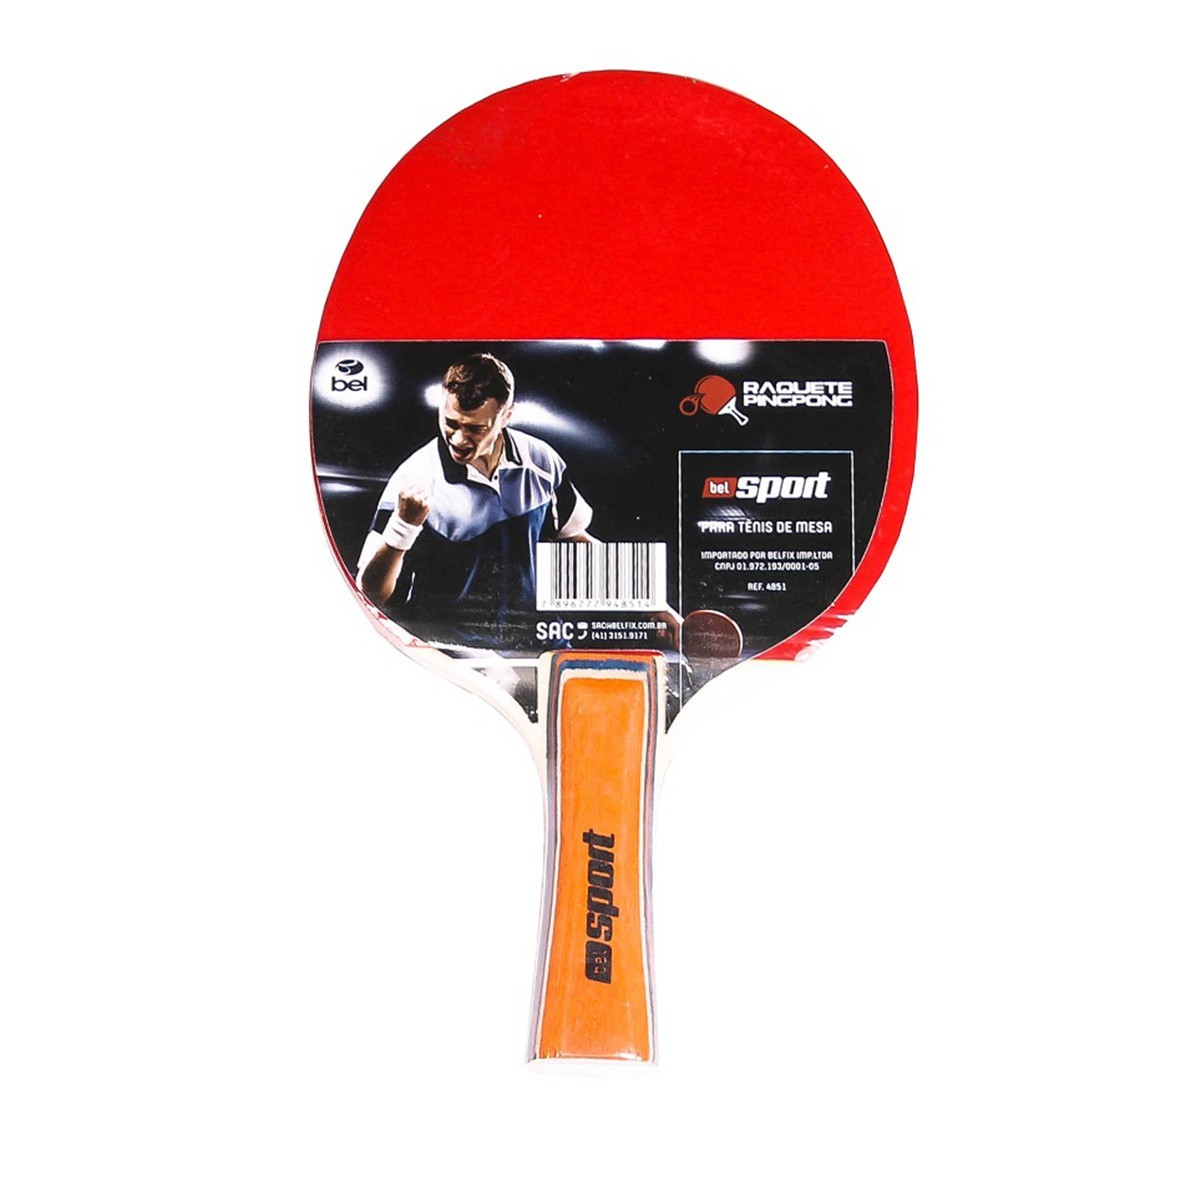 Raquete para Ping Pong Belfix The Original